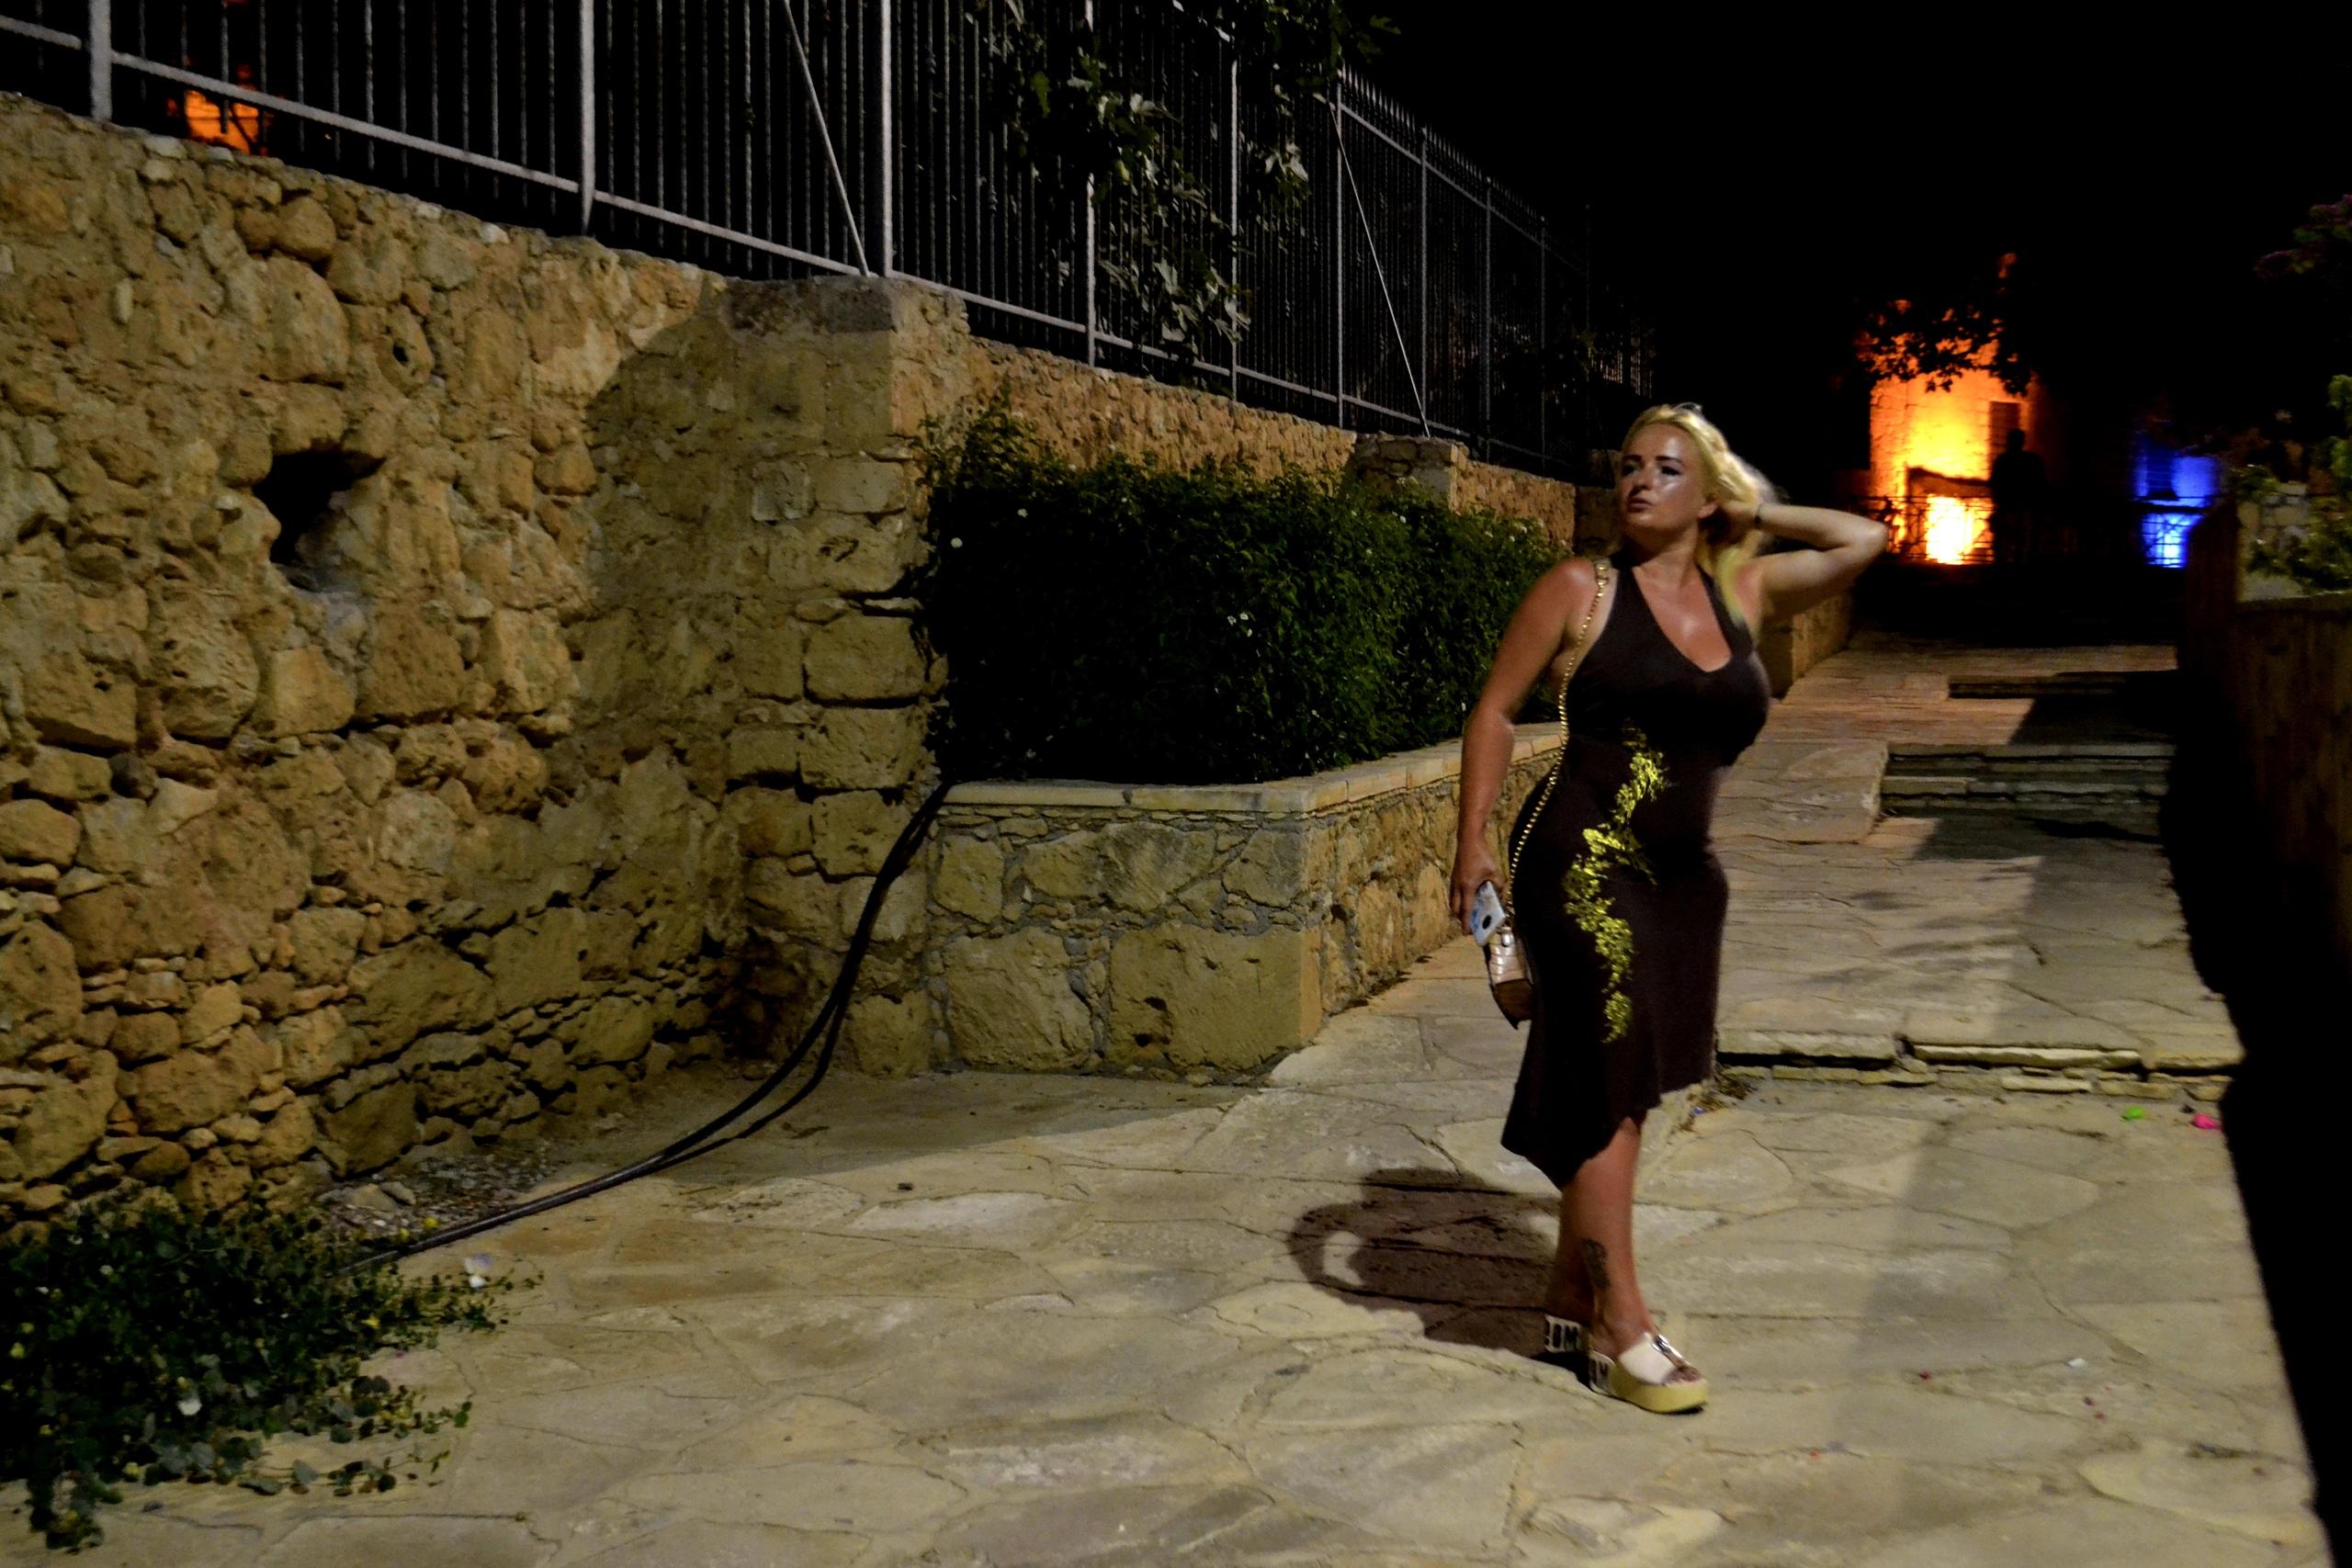 Елена Руденко (Валтея). Кипр. Айия-Напа (фото). - Страница 9 LnERgjaLarE